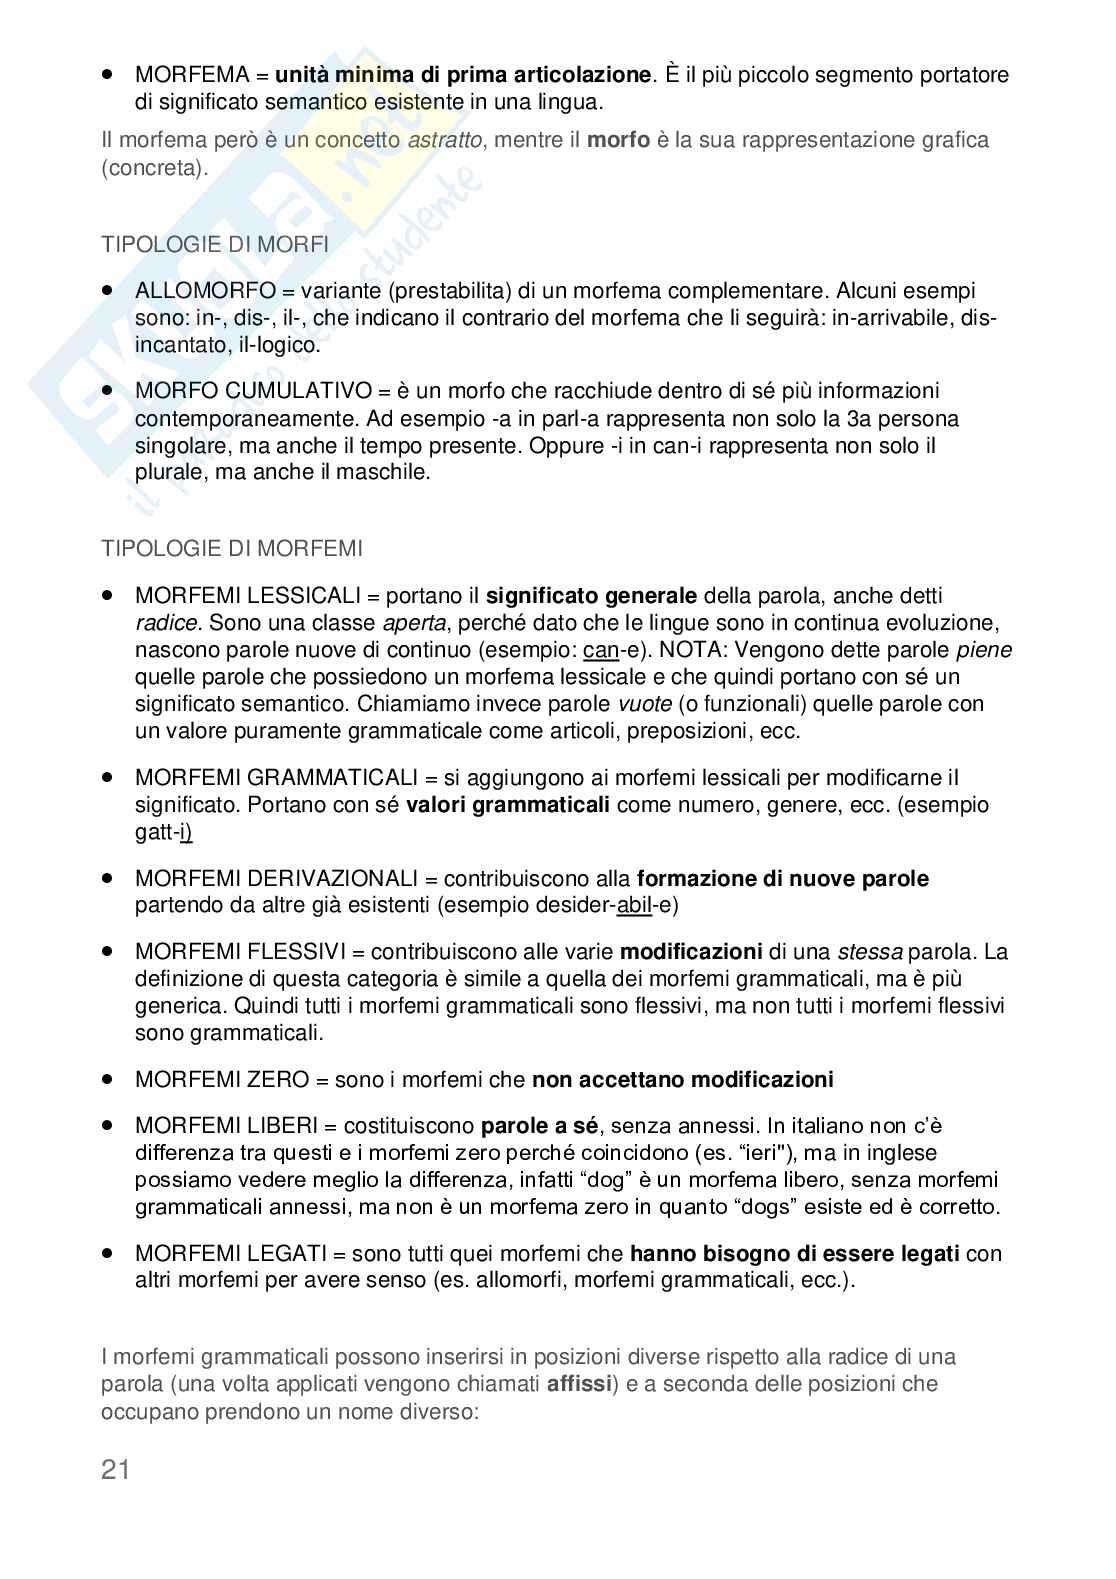 Appunti Linguistica Generale Pag. 21